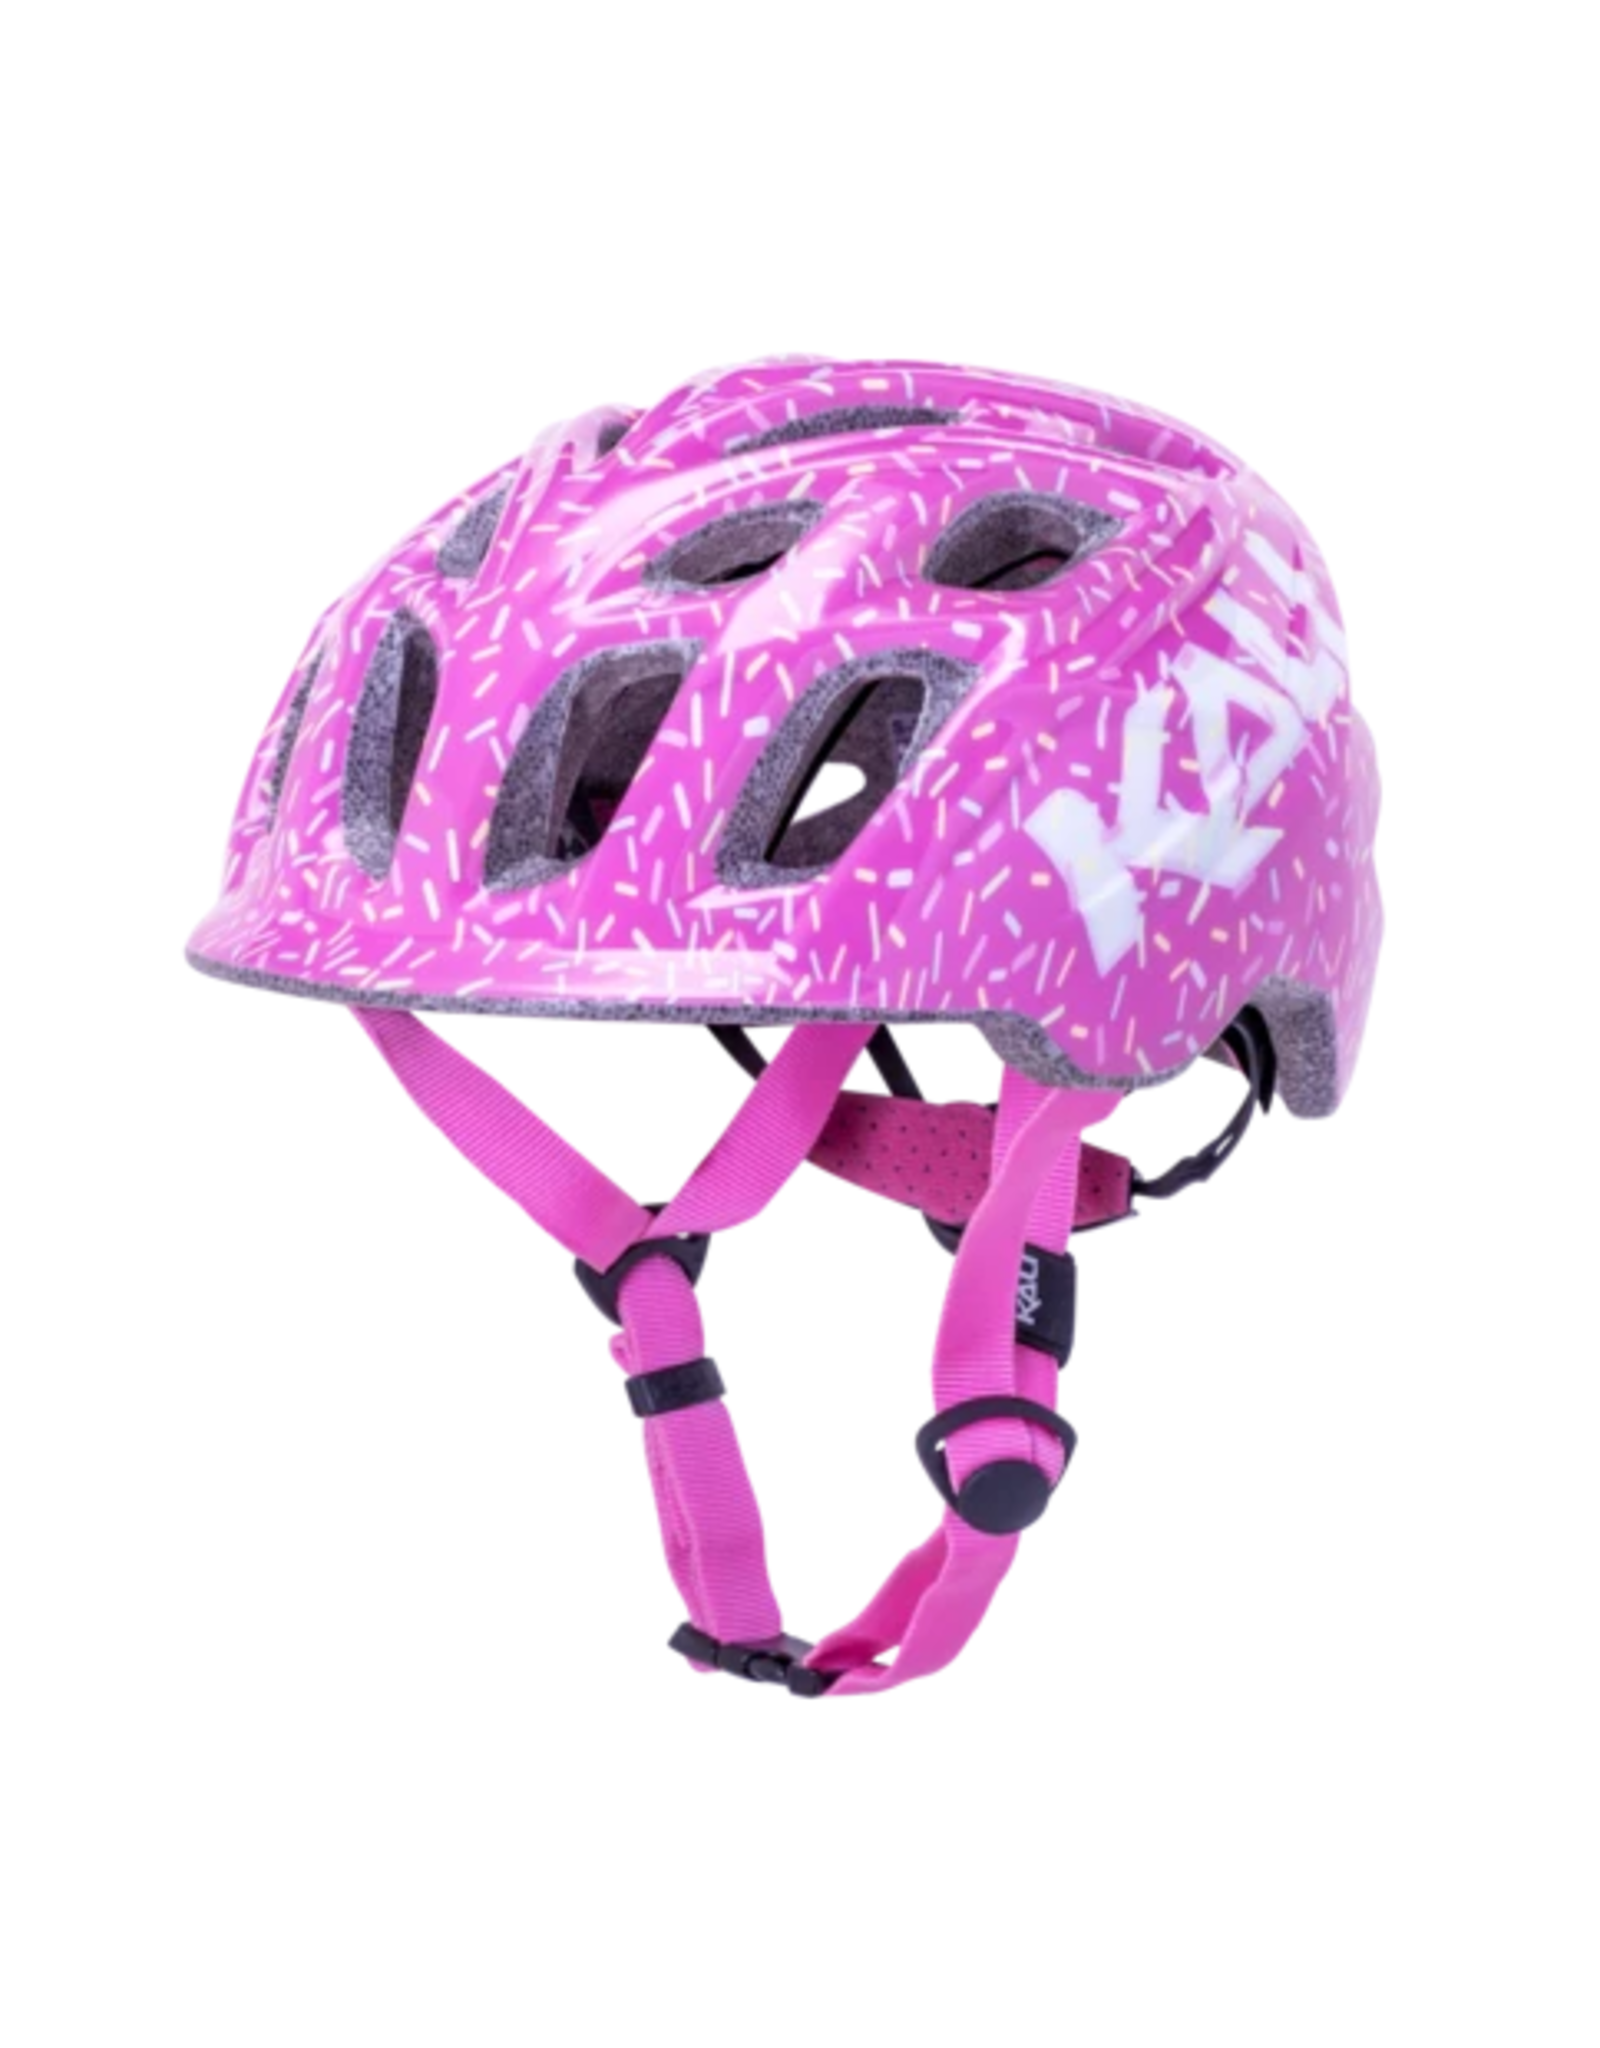 Kali Kali Chakra Sprinkles Helmet - Pink, Small